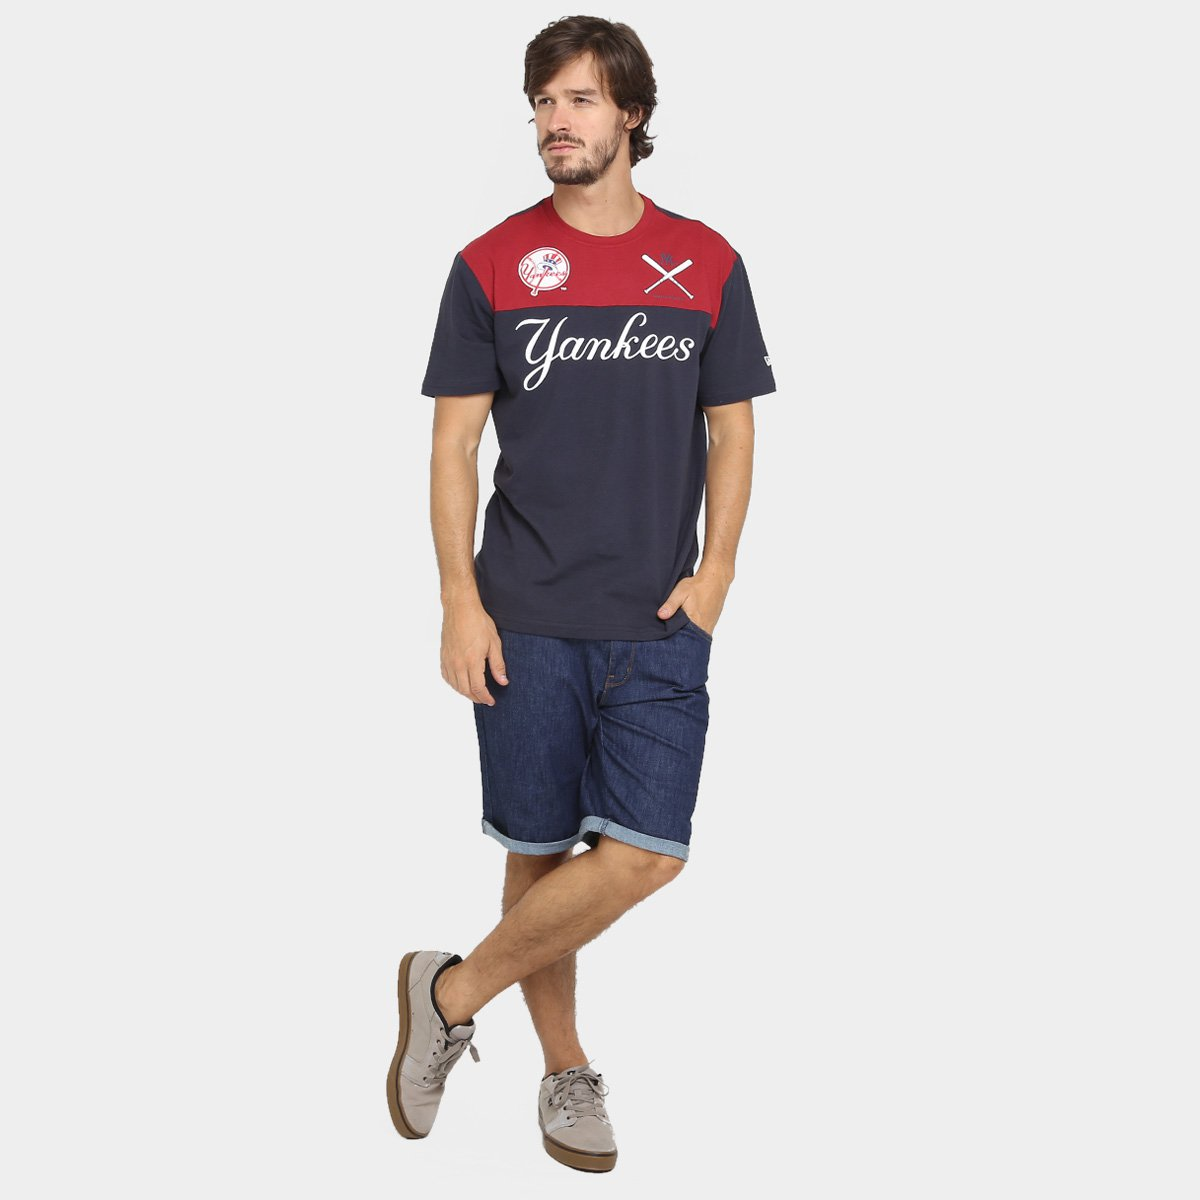 Camiseta New Era MLB Basket 14 New York Yankees - Compre Agora  eea5b8aa18b